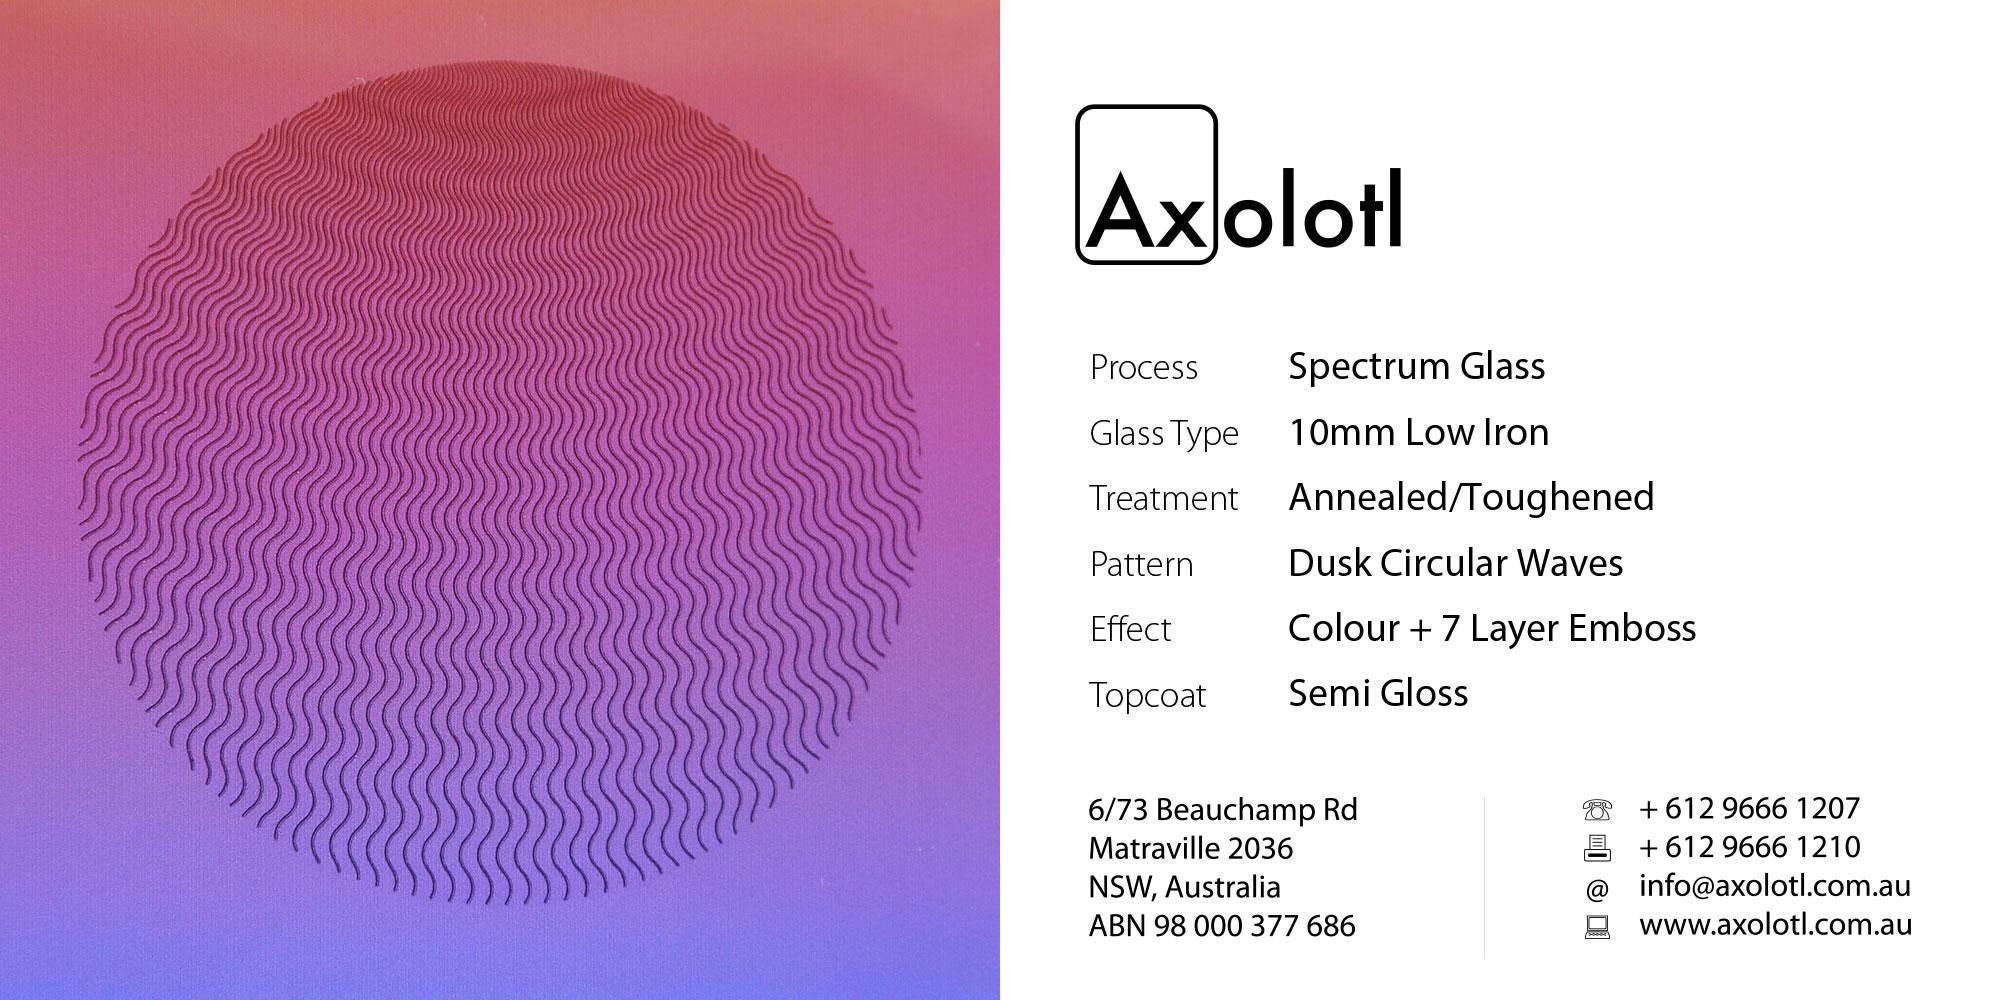 Axolotl_SpectrumGlass_DuskCircularWaves.jpg